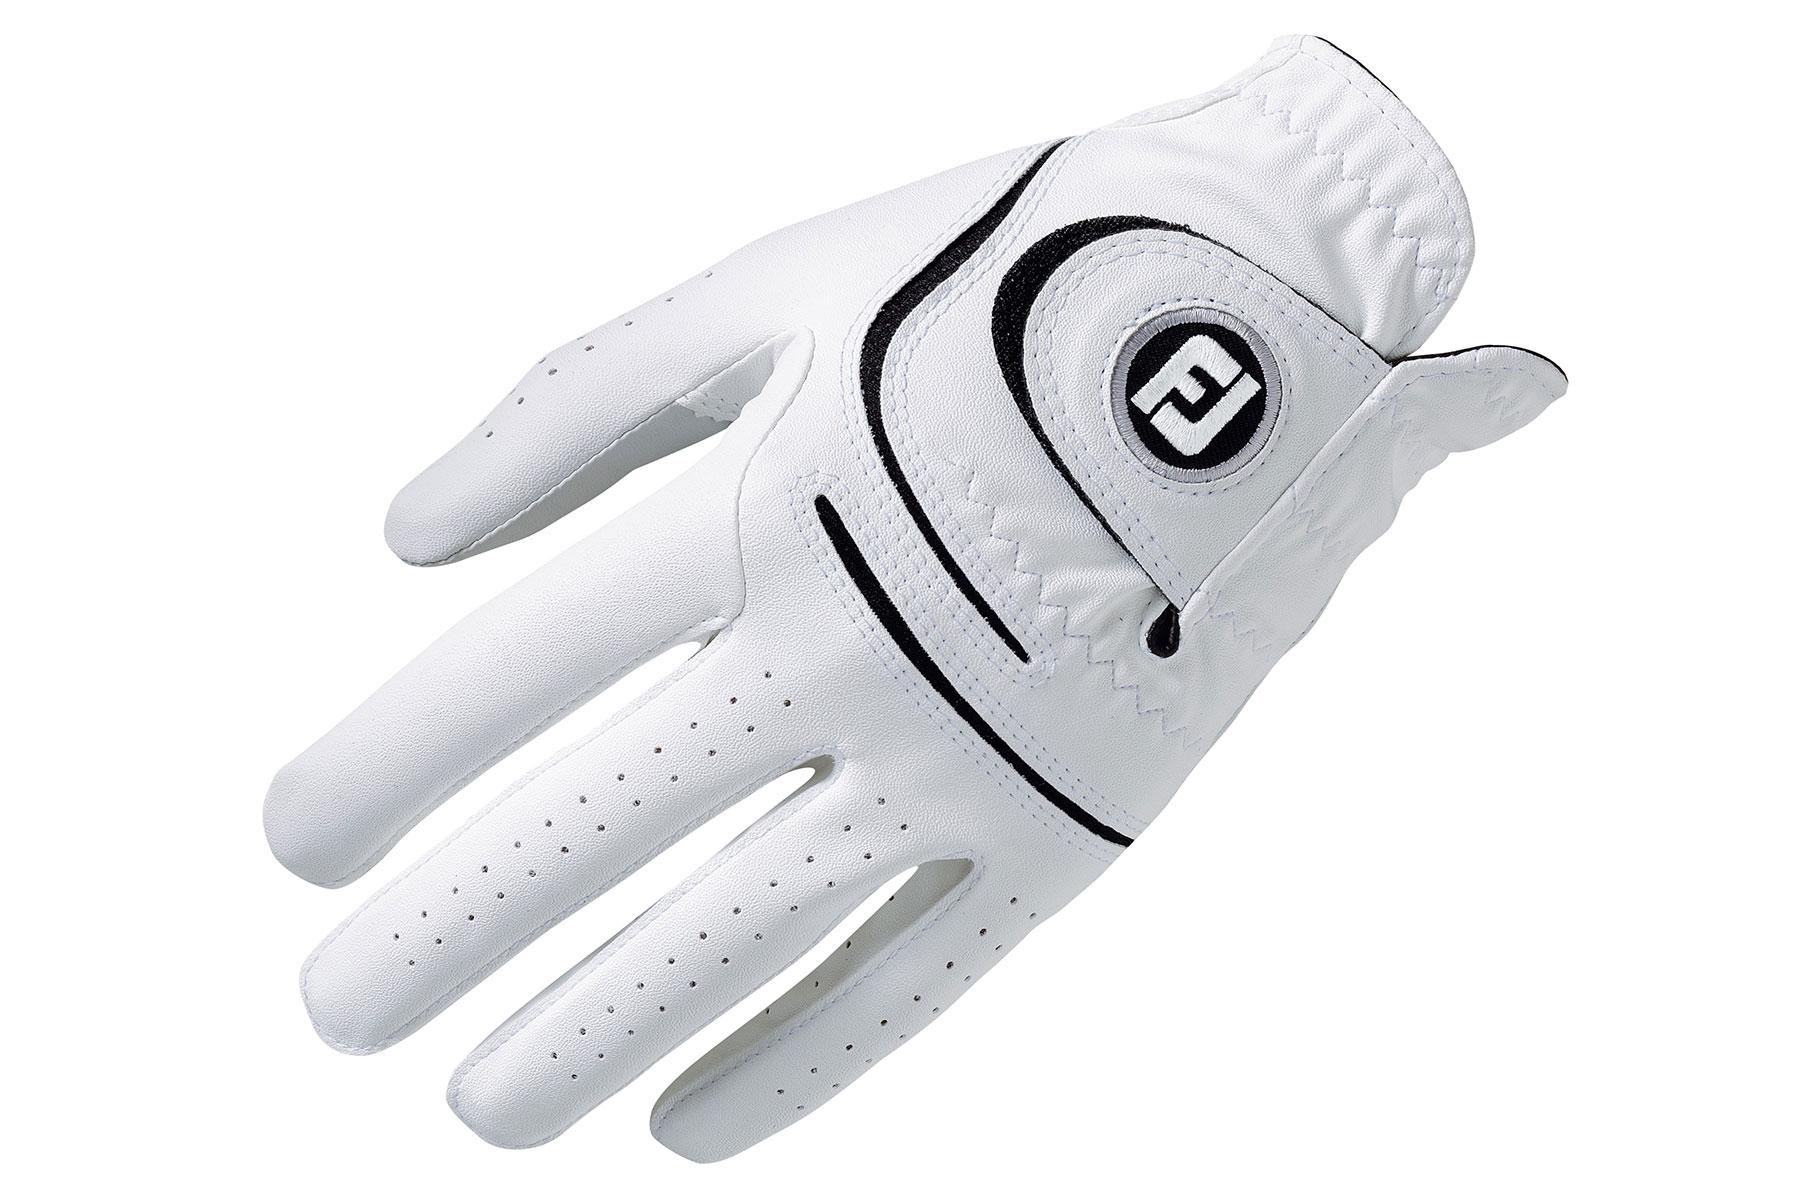 Ladies leather golf gloves uk - Footjoy Weathersof Footjoy Weathersof Footjoy Weathersof